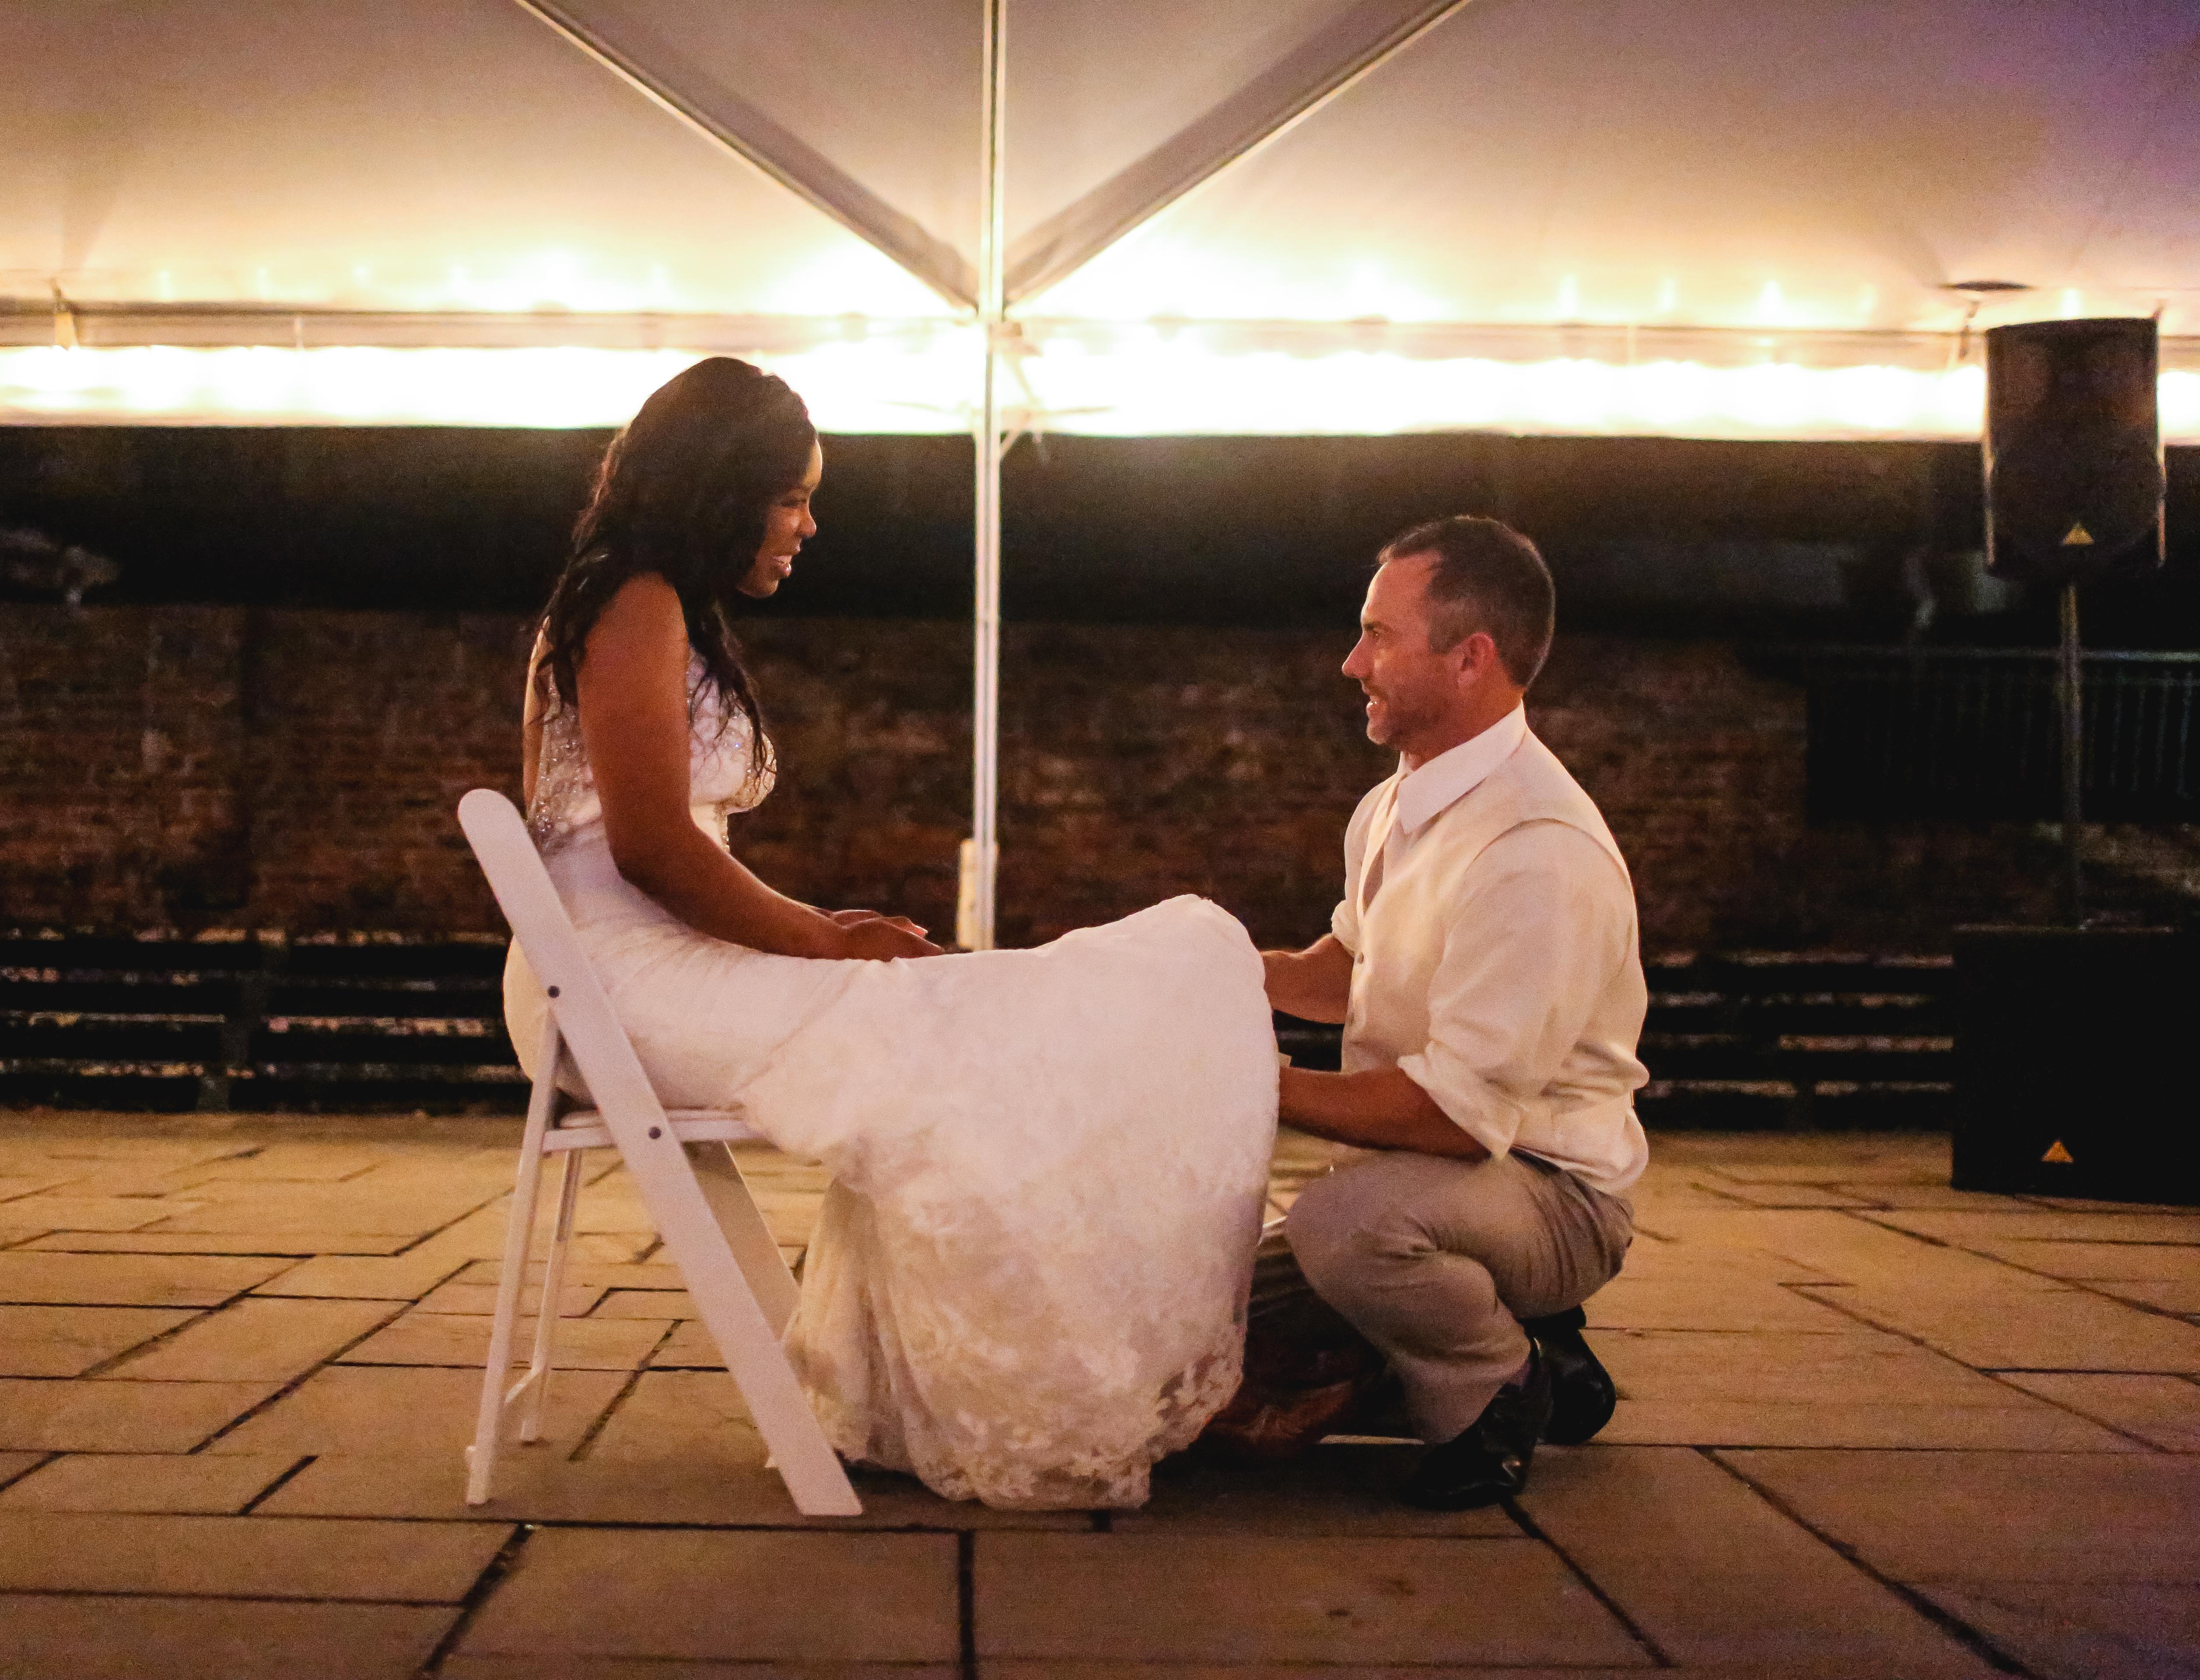 richmond-virginia-tredegar-historic-wedding-photographer-photography-heather-michelle-photography-1-of-1-133